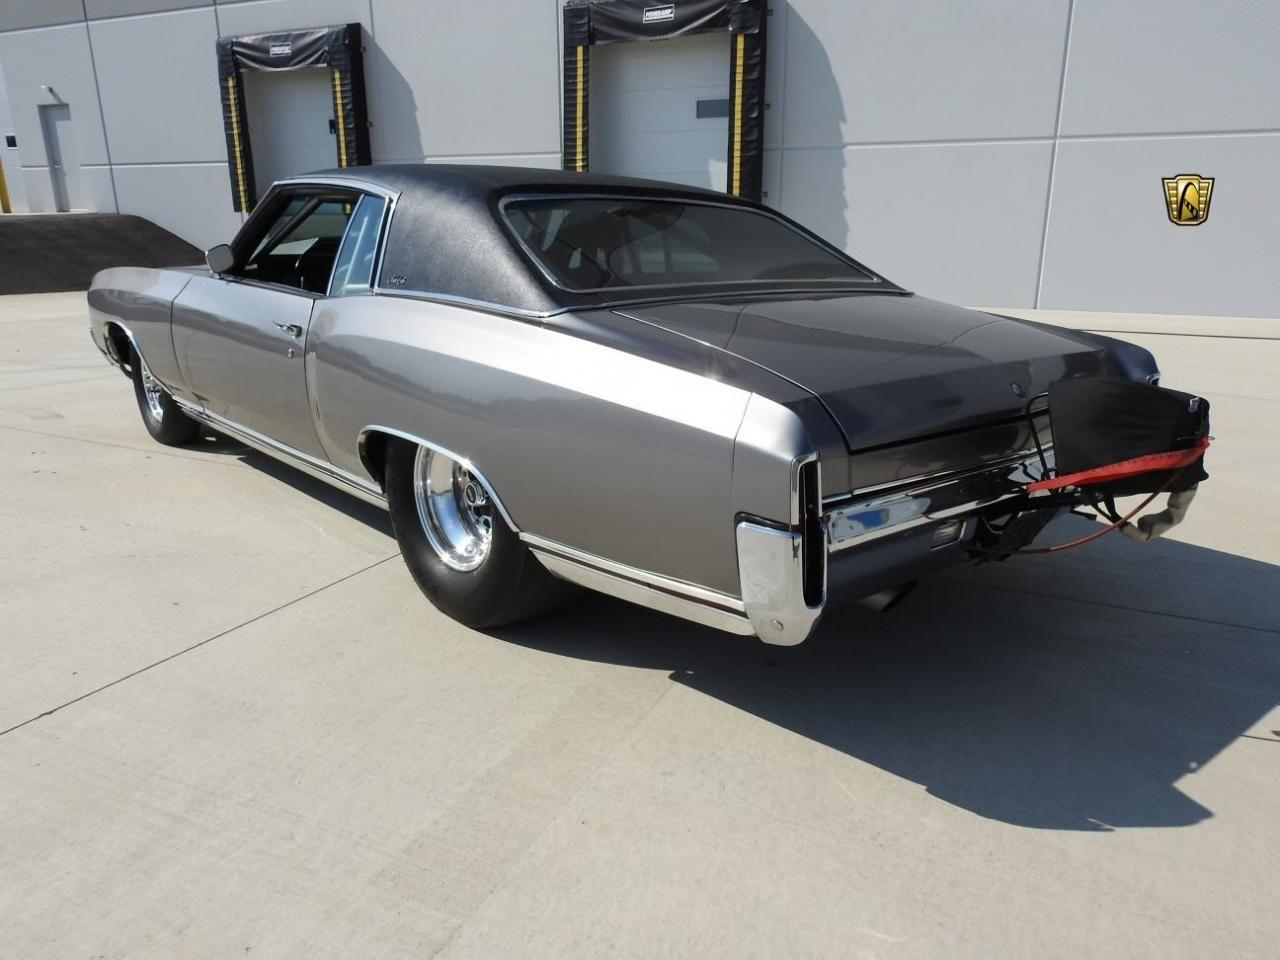 1970 Chevrolet Monte Carlo For Sale Classiccars Com Cc 917026